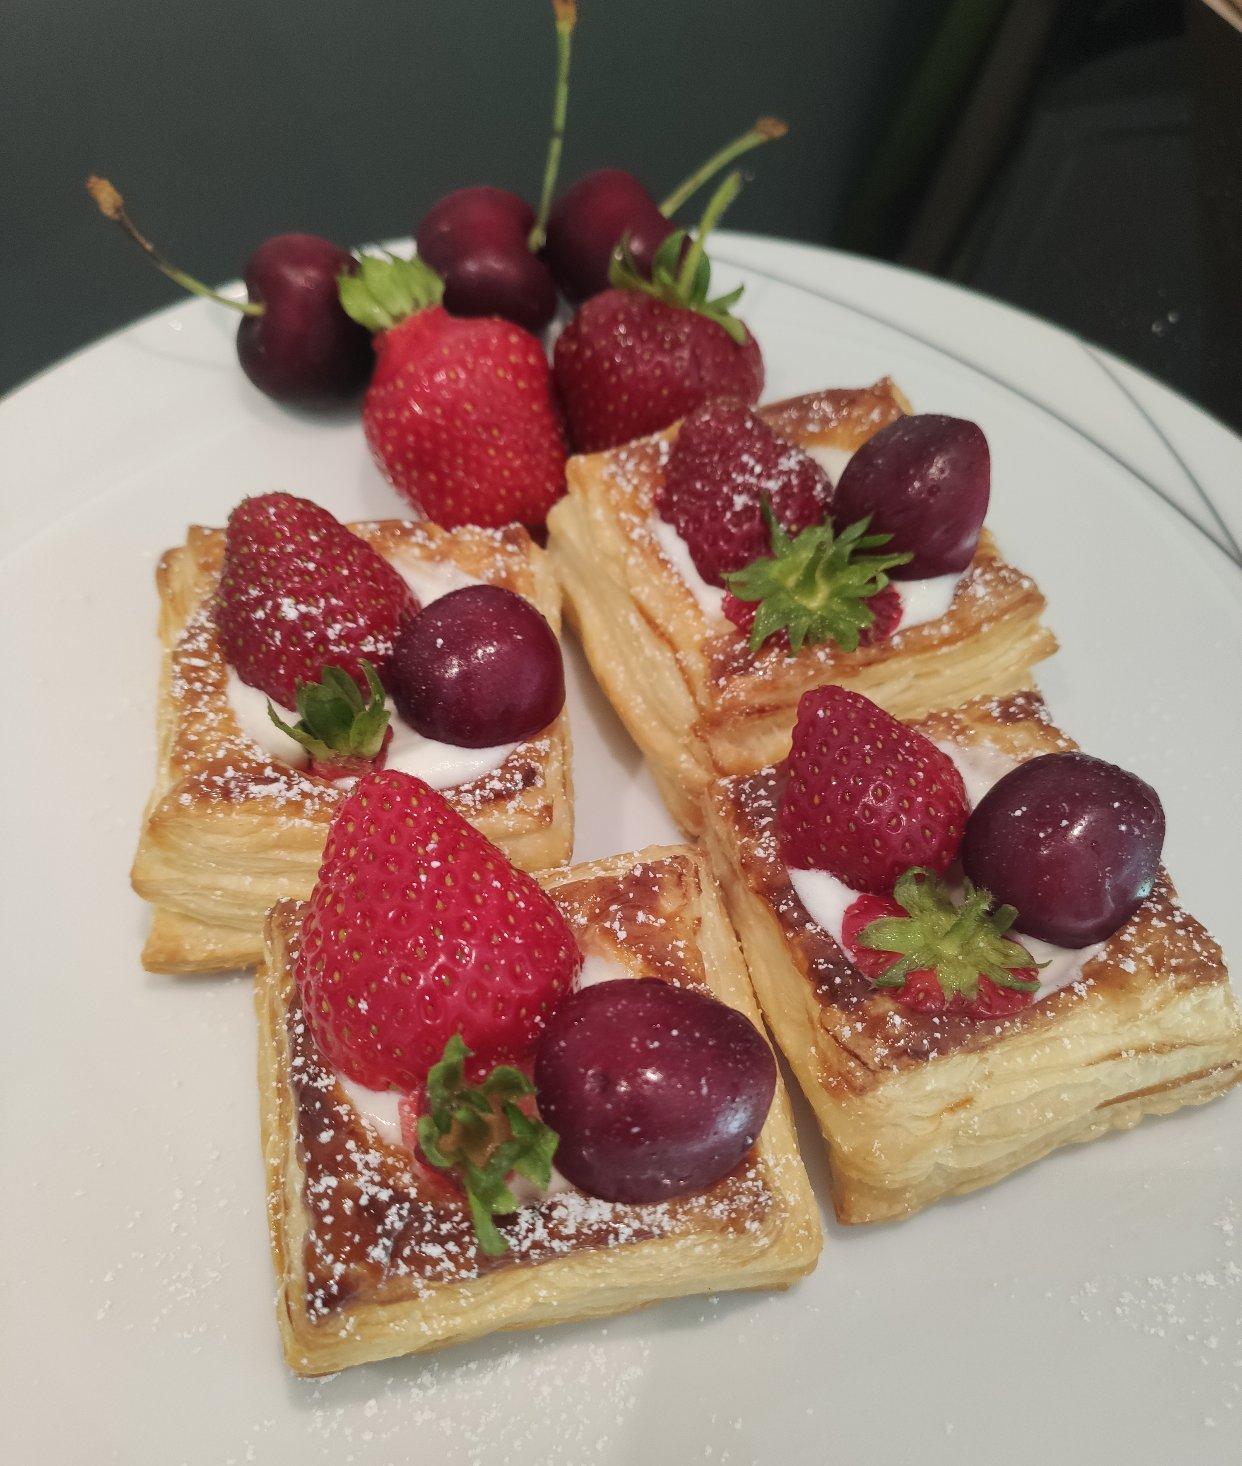 德国🇩🇪草莓季节